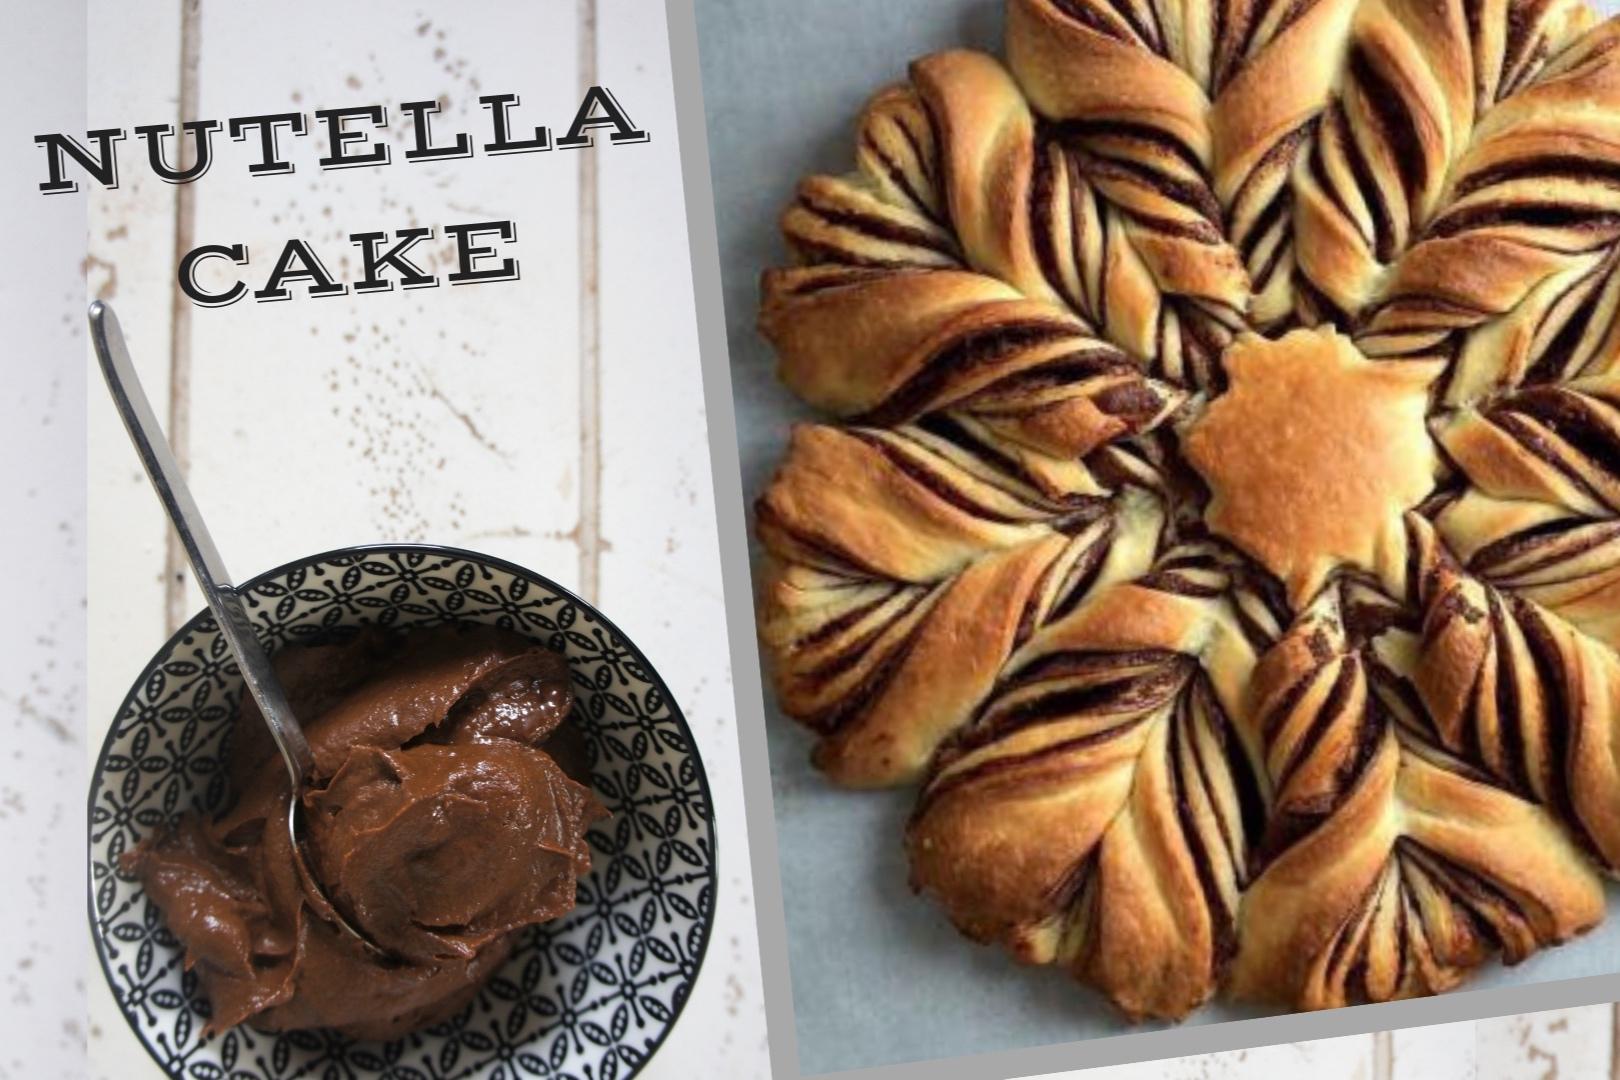 Nutella+cake.jpg